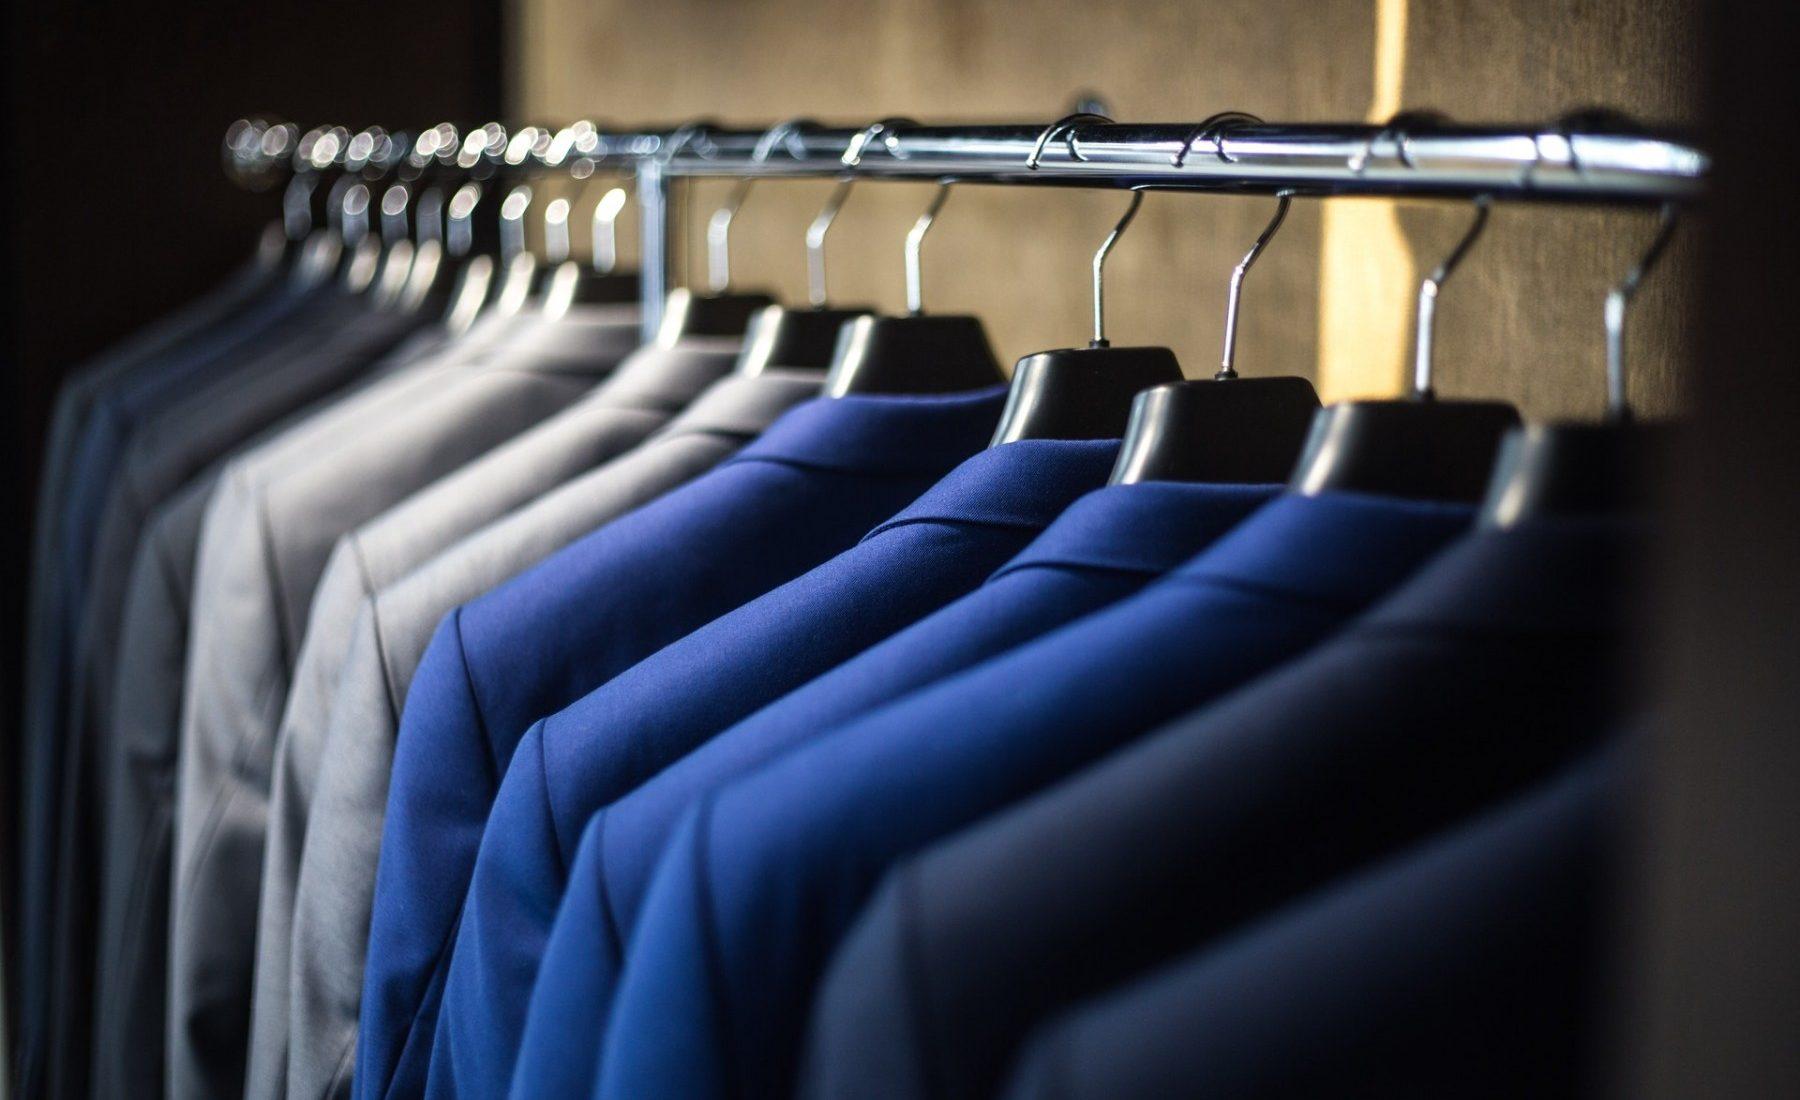 Raffles Singapore - Raffles Laundry Service